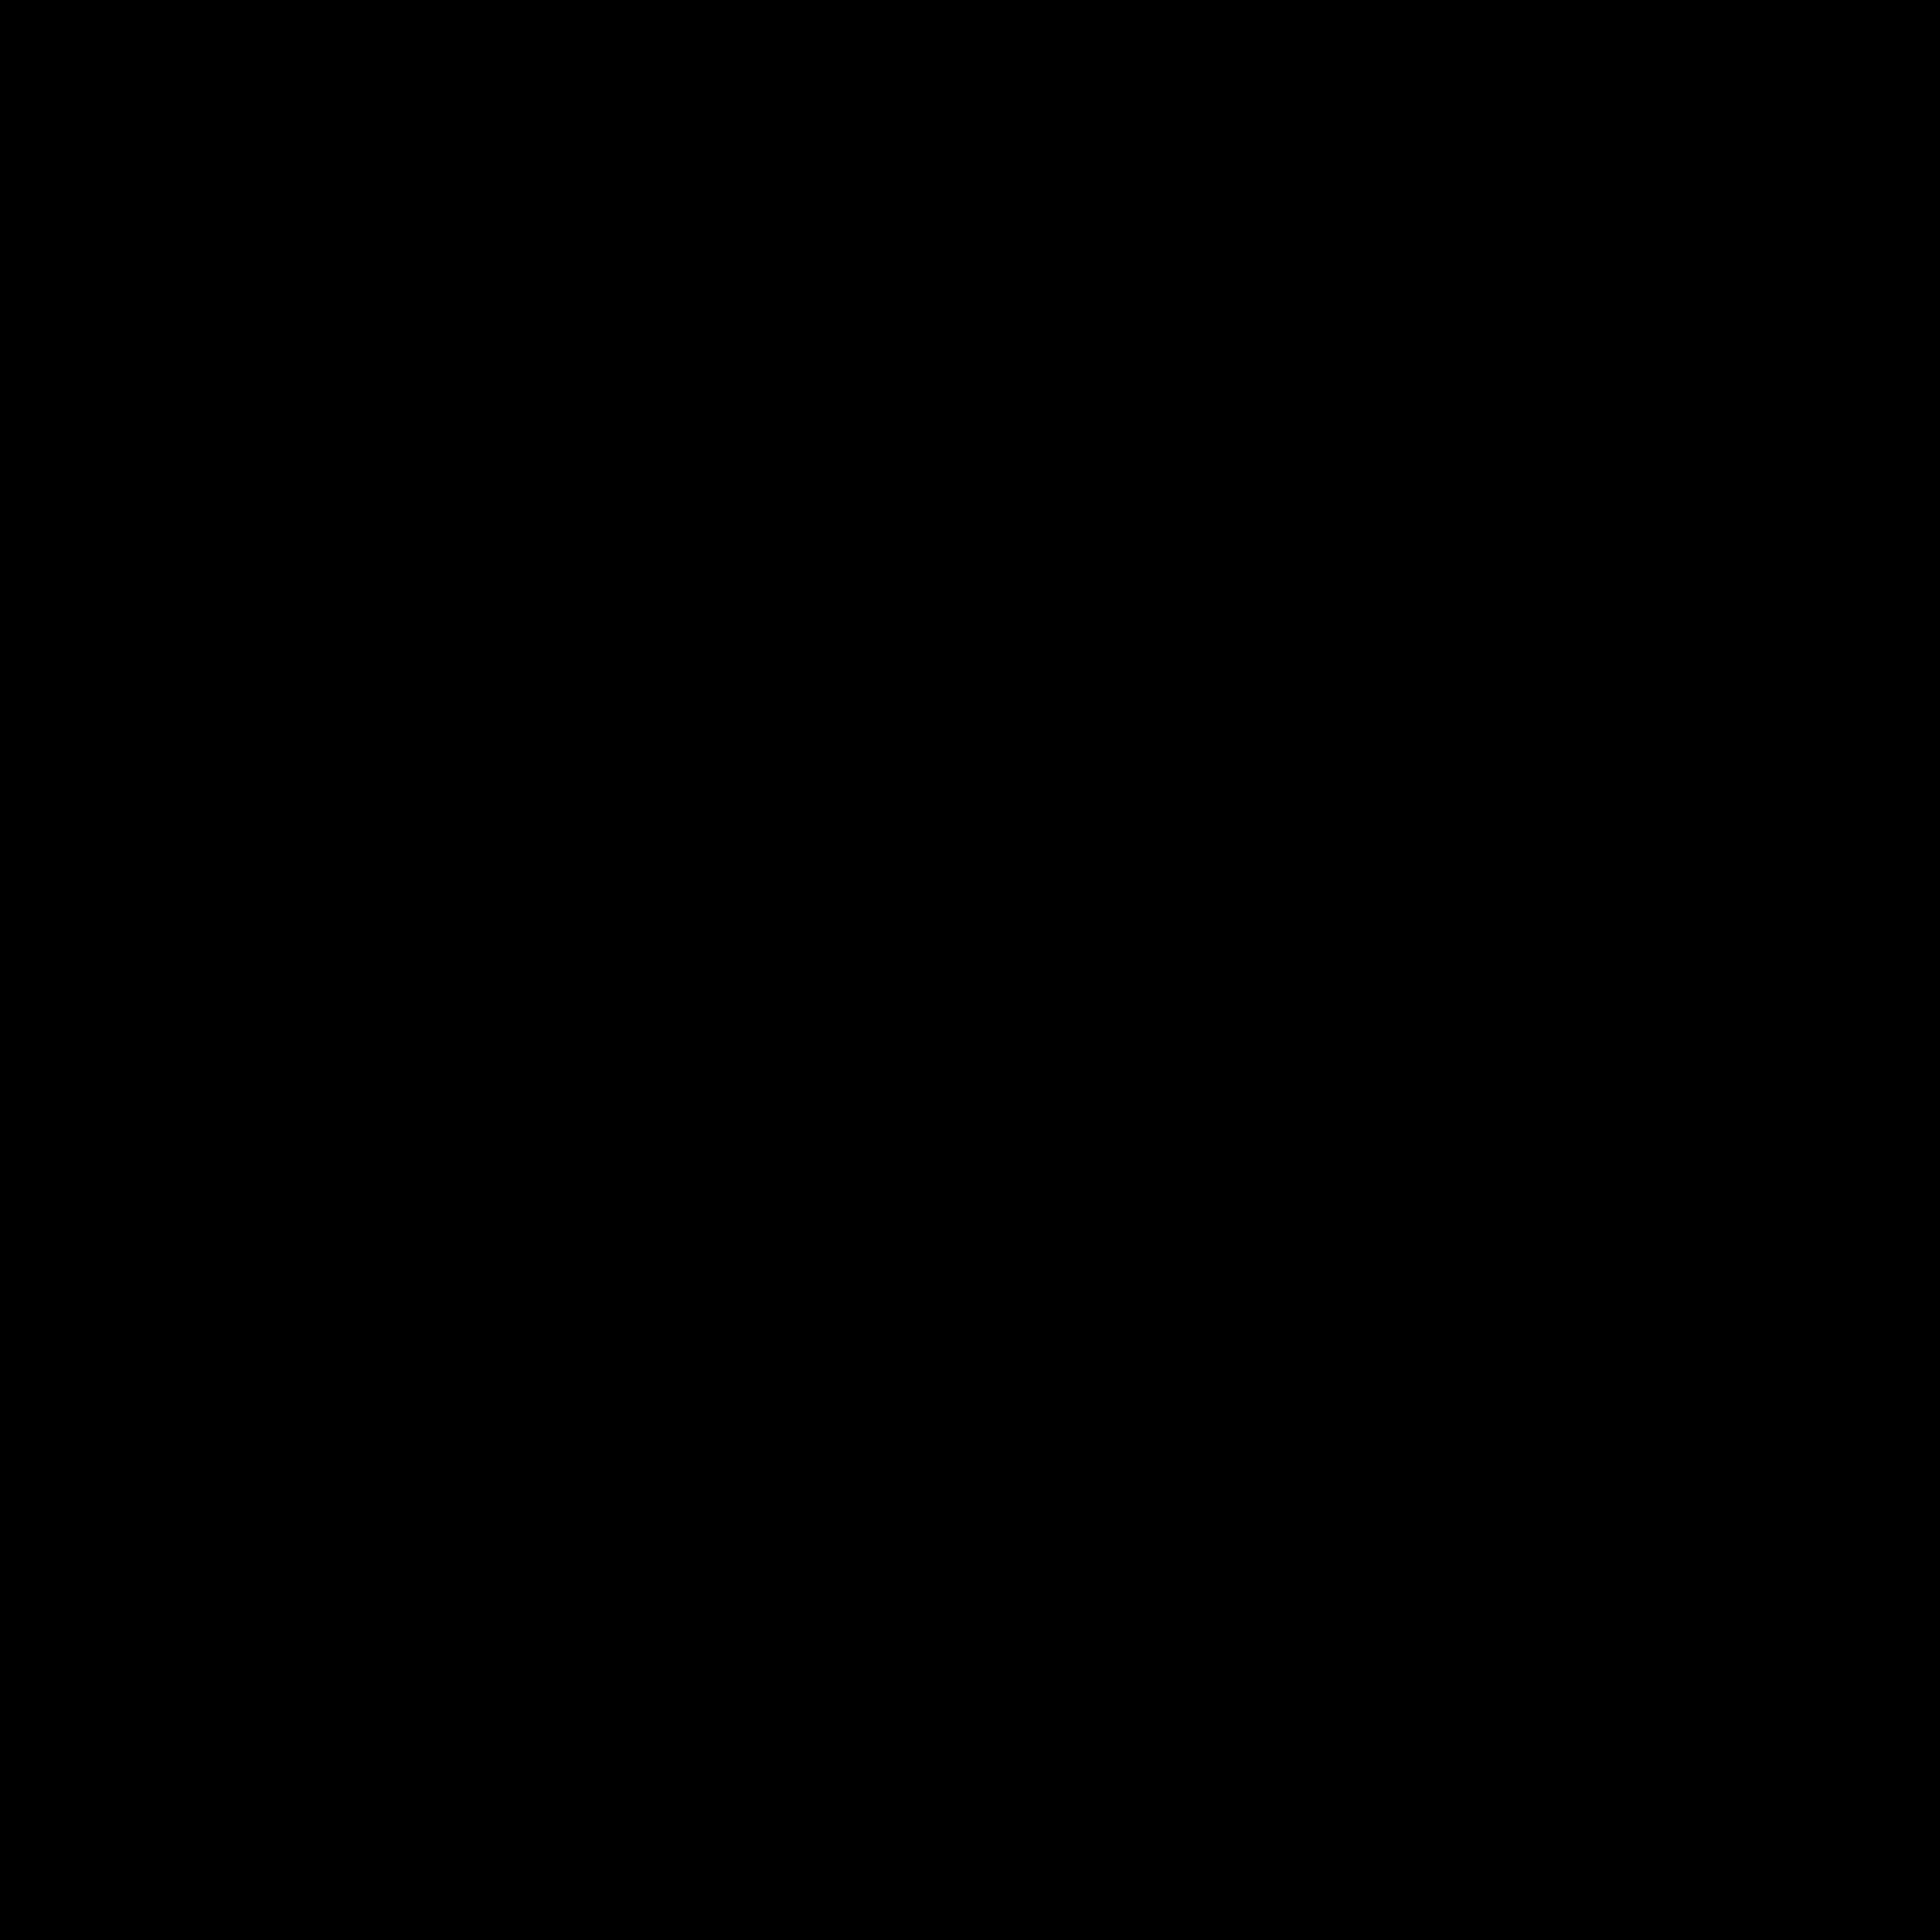 File:Apple logo black svg - Wikimedia Commons